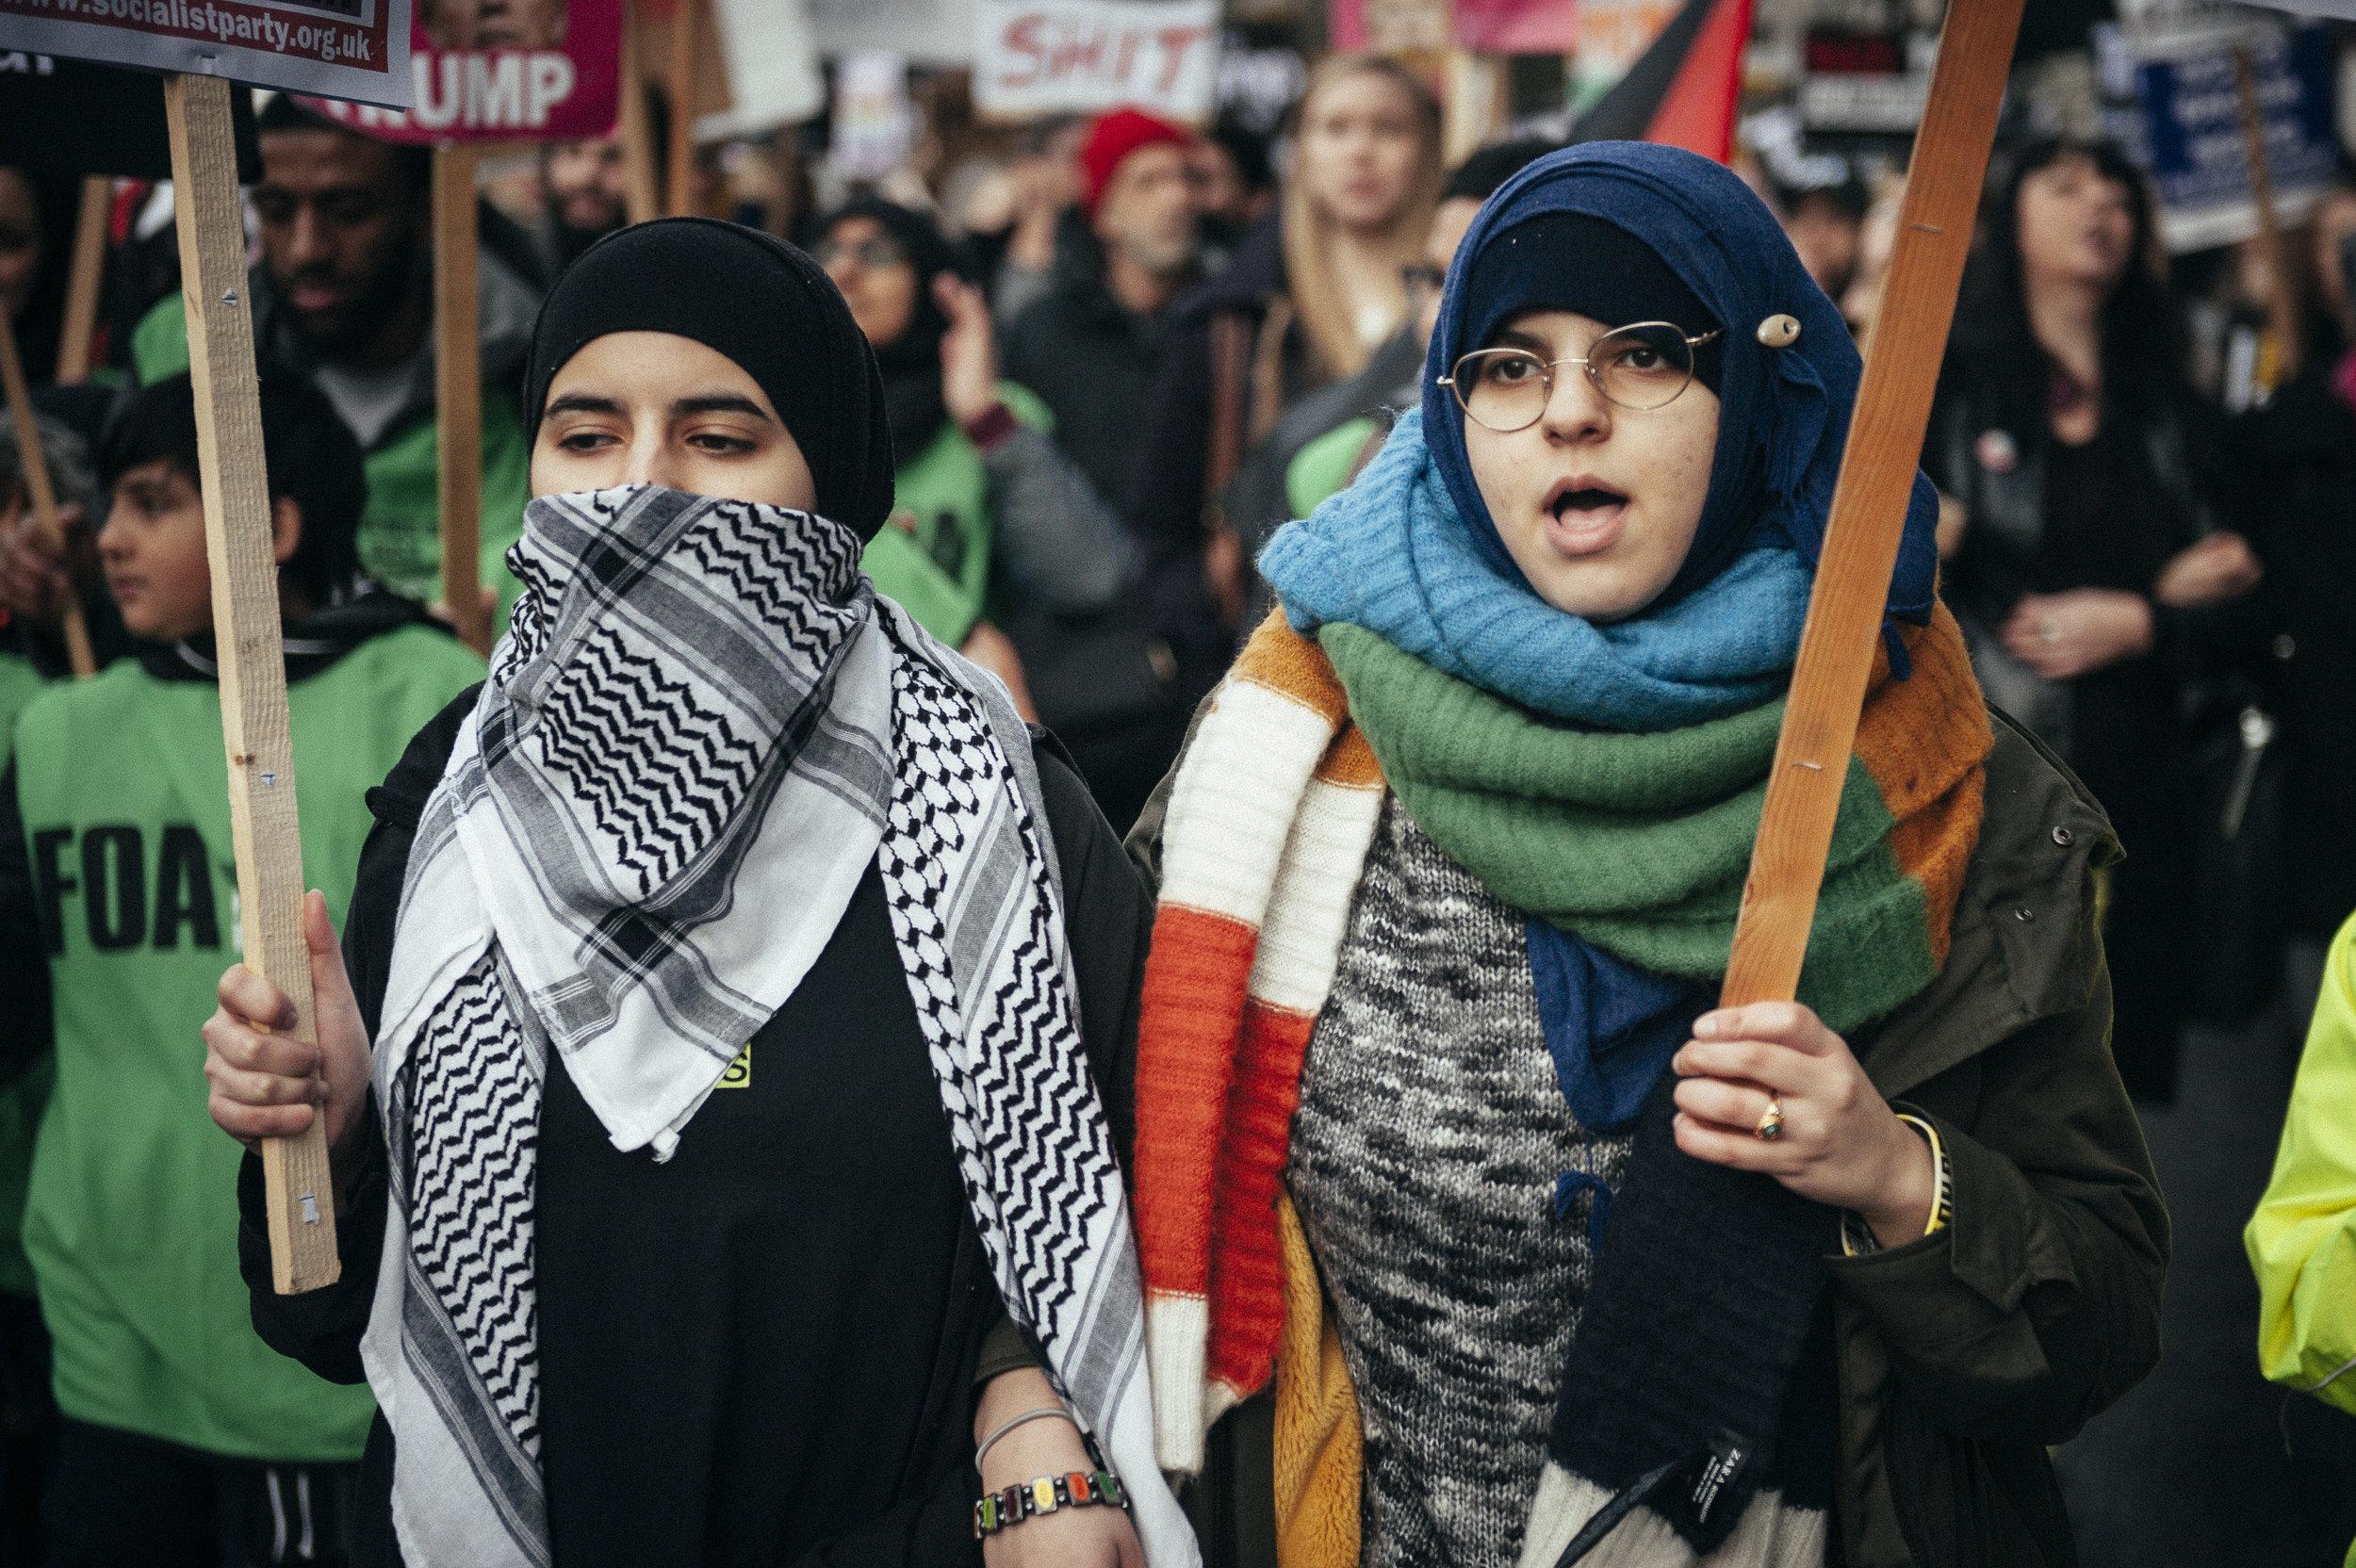 Muslim Ban Protest 040217-30.jpg